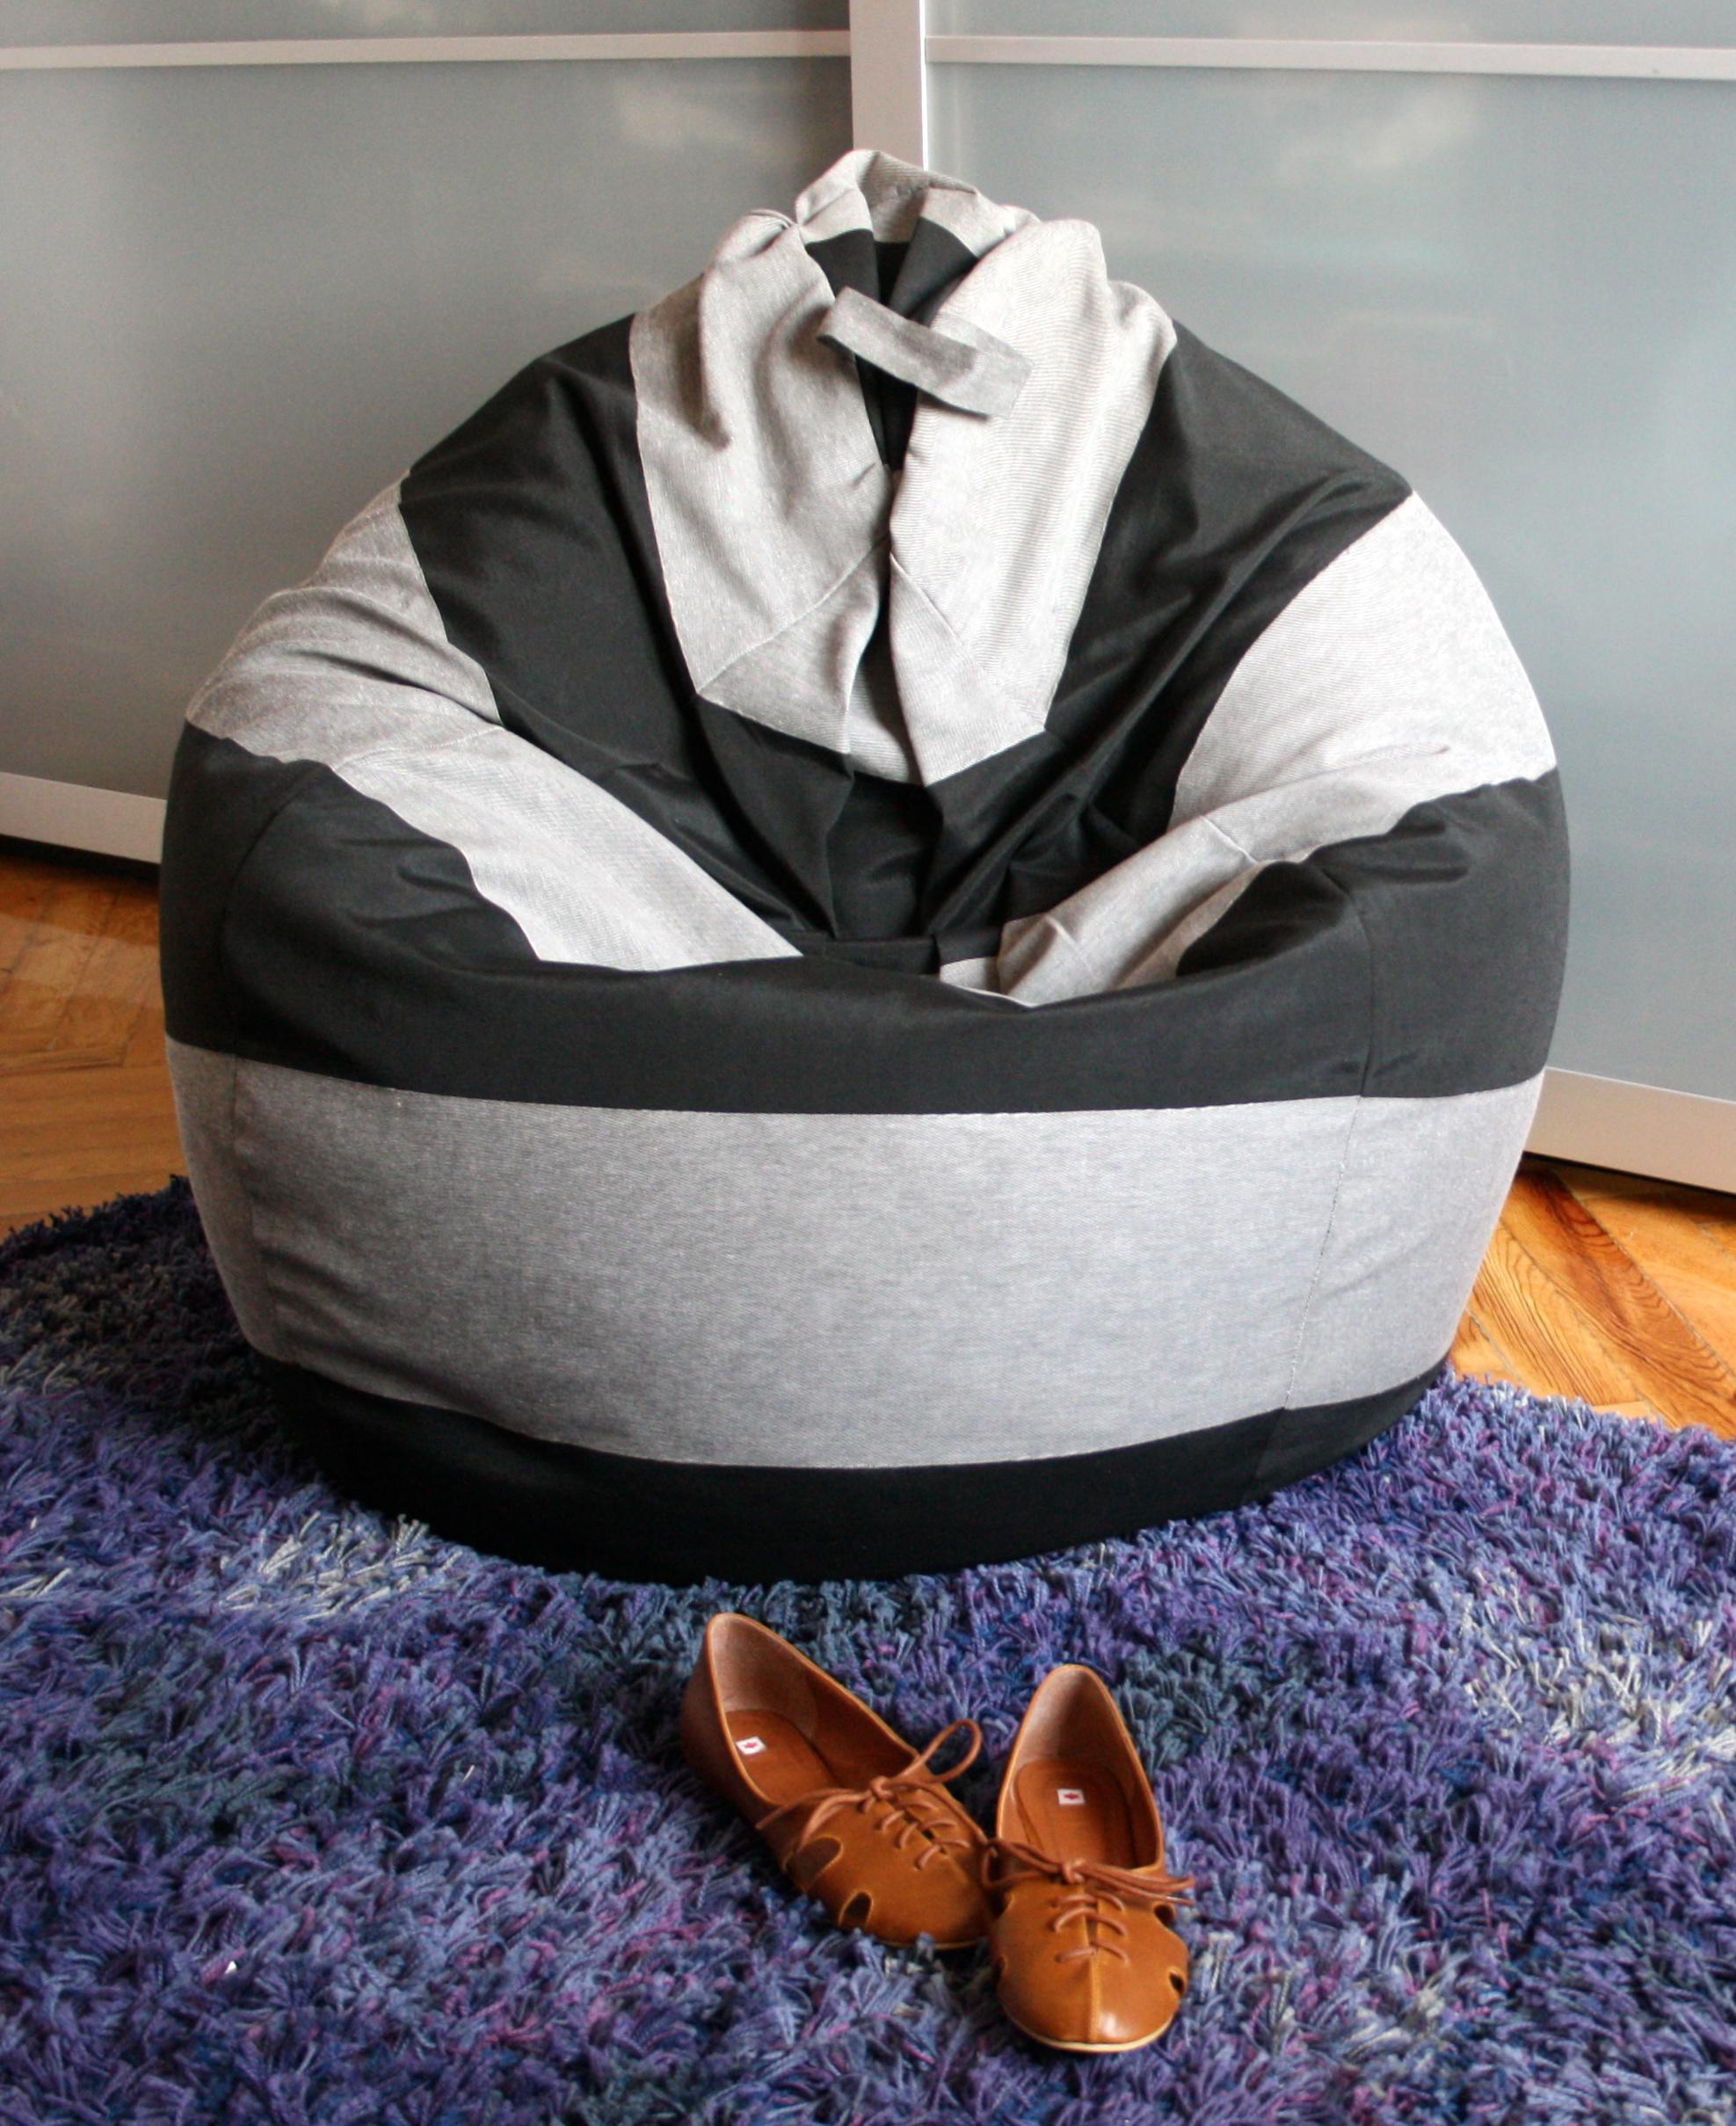 How to make bean bag chairs - How To Make Bean Bag Chairs 55